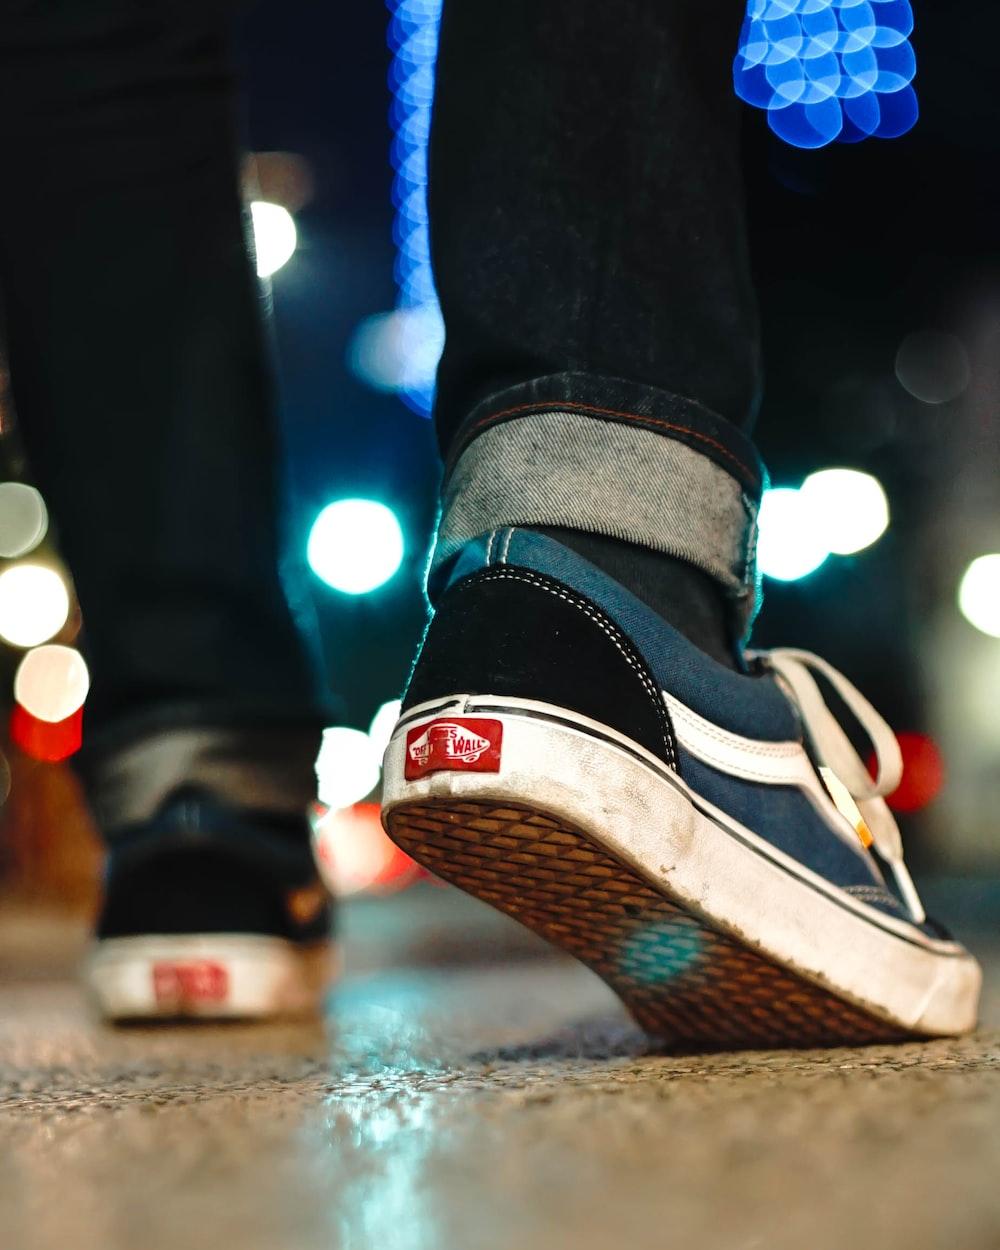 man walking on the road during nighttime